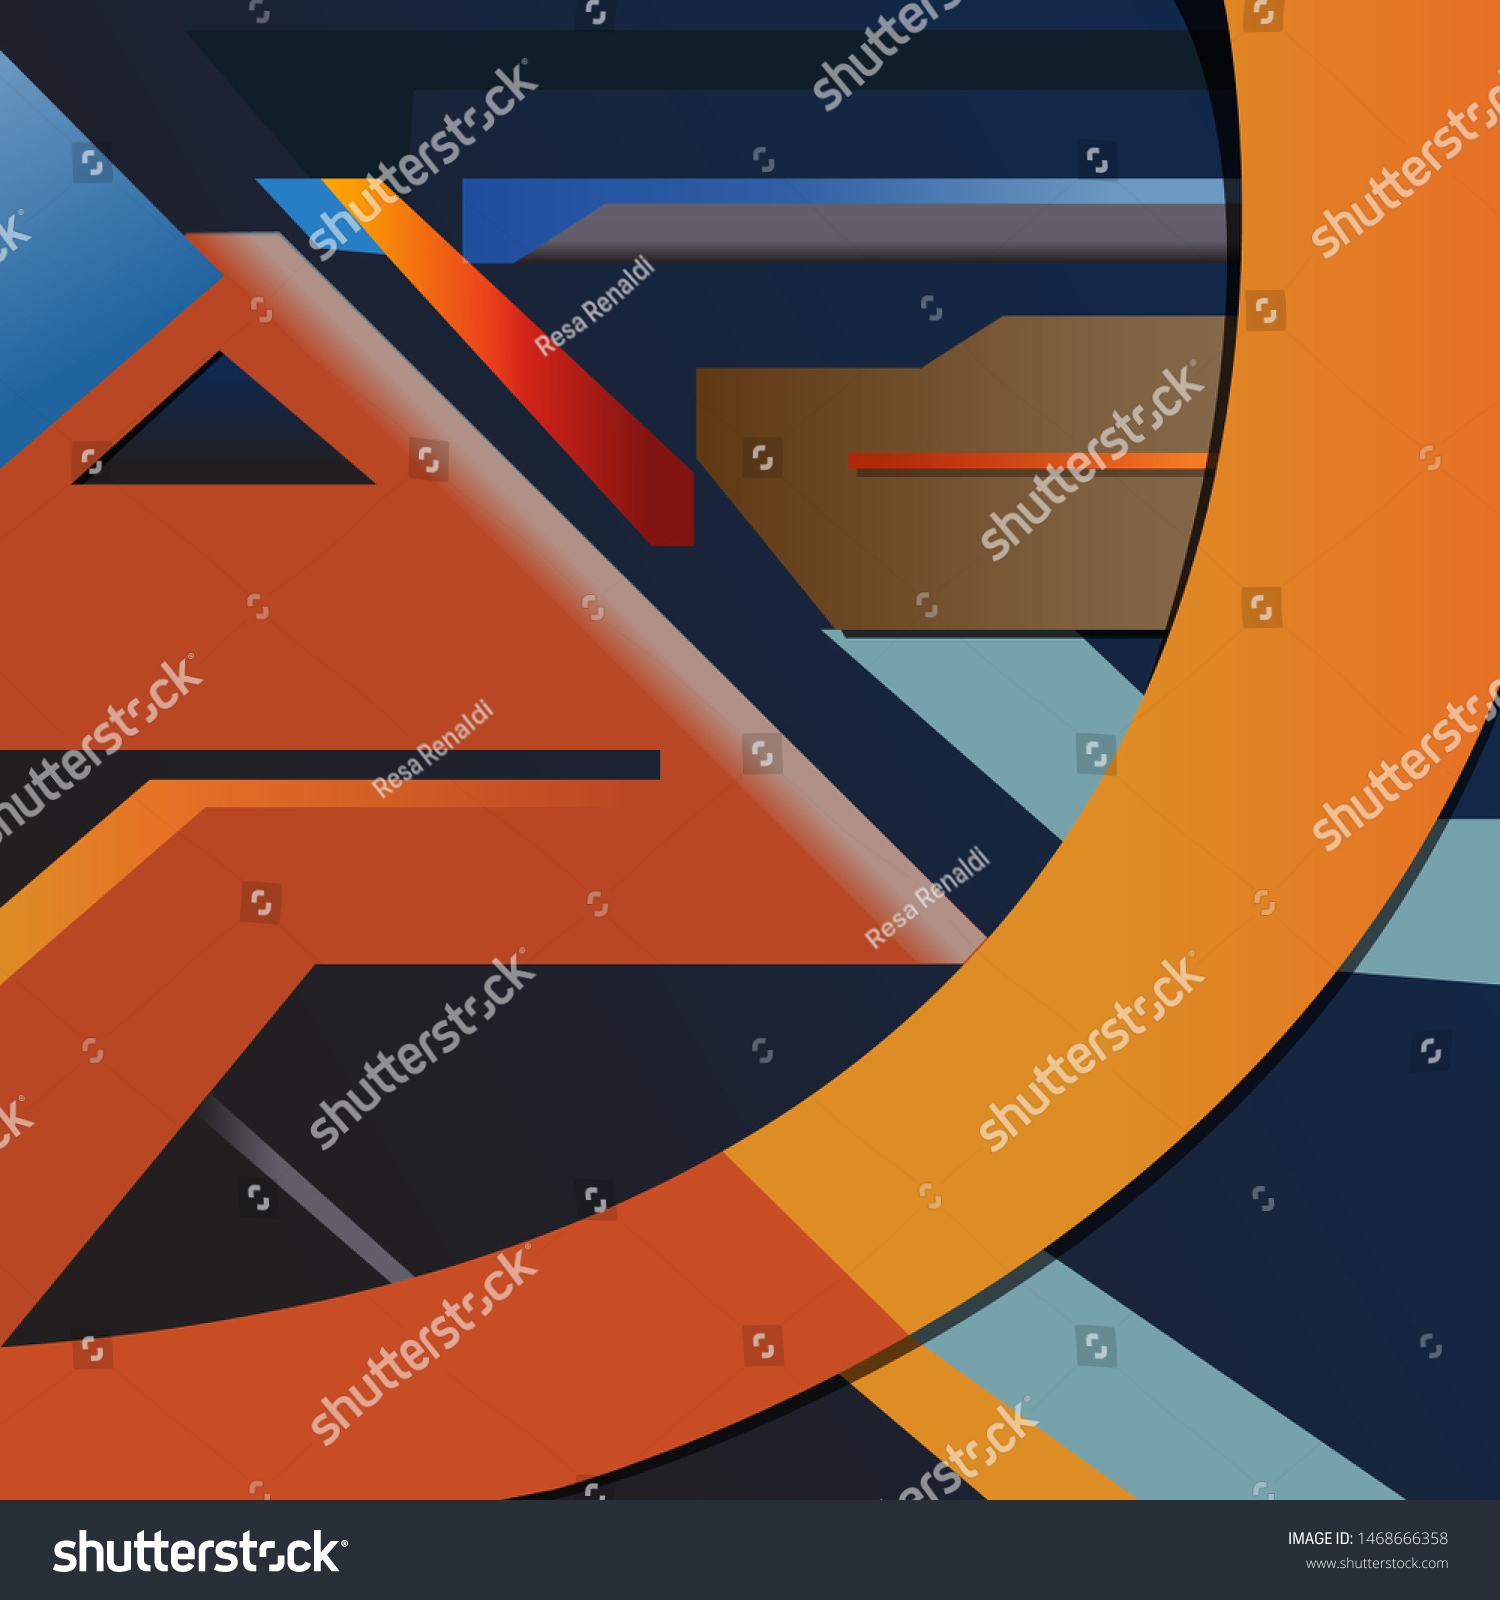 Flat Design Abstrak Wallpaper Vector Stock Vector Royalty